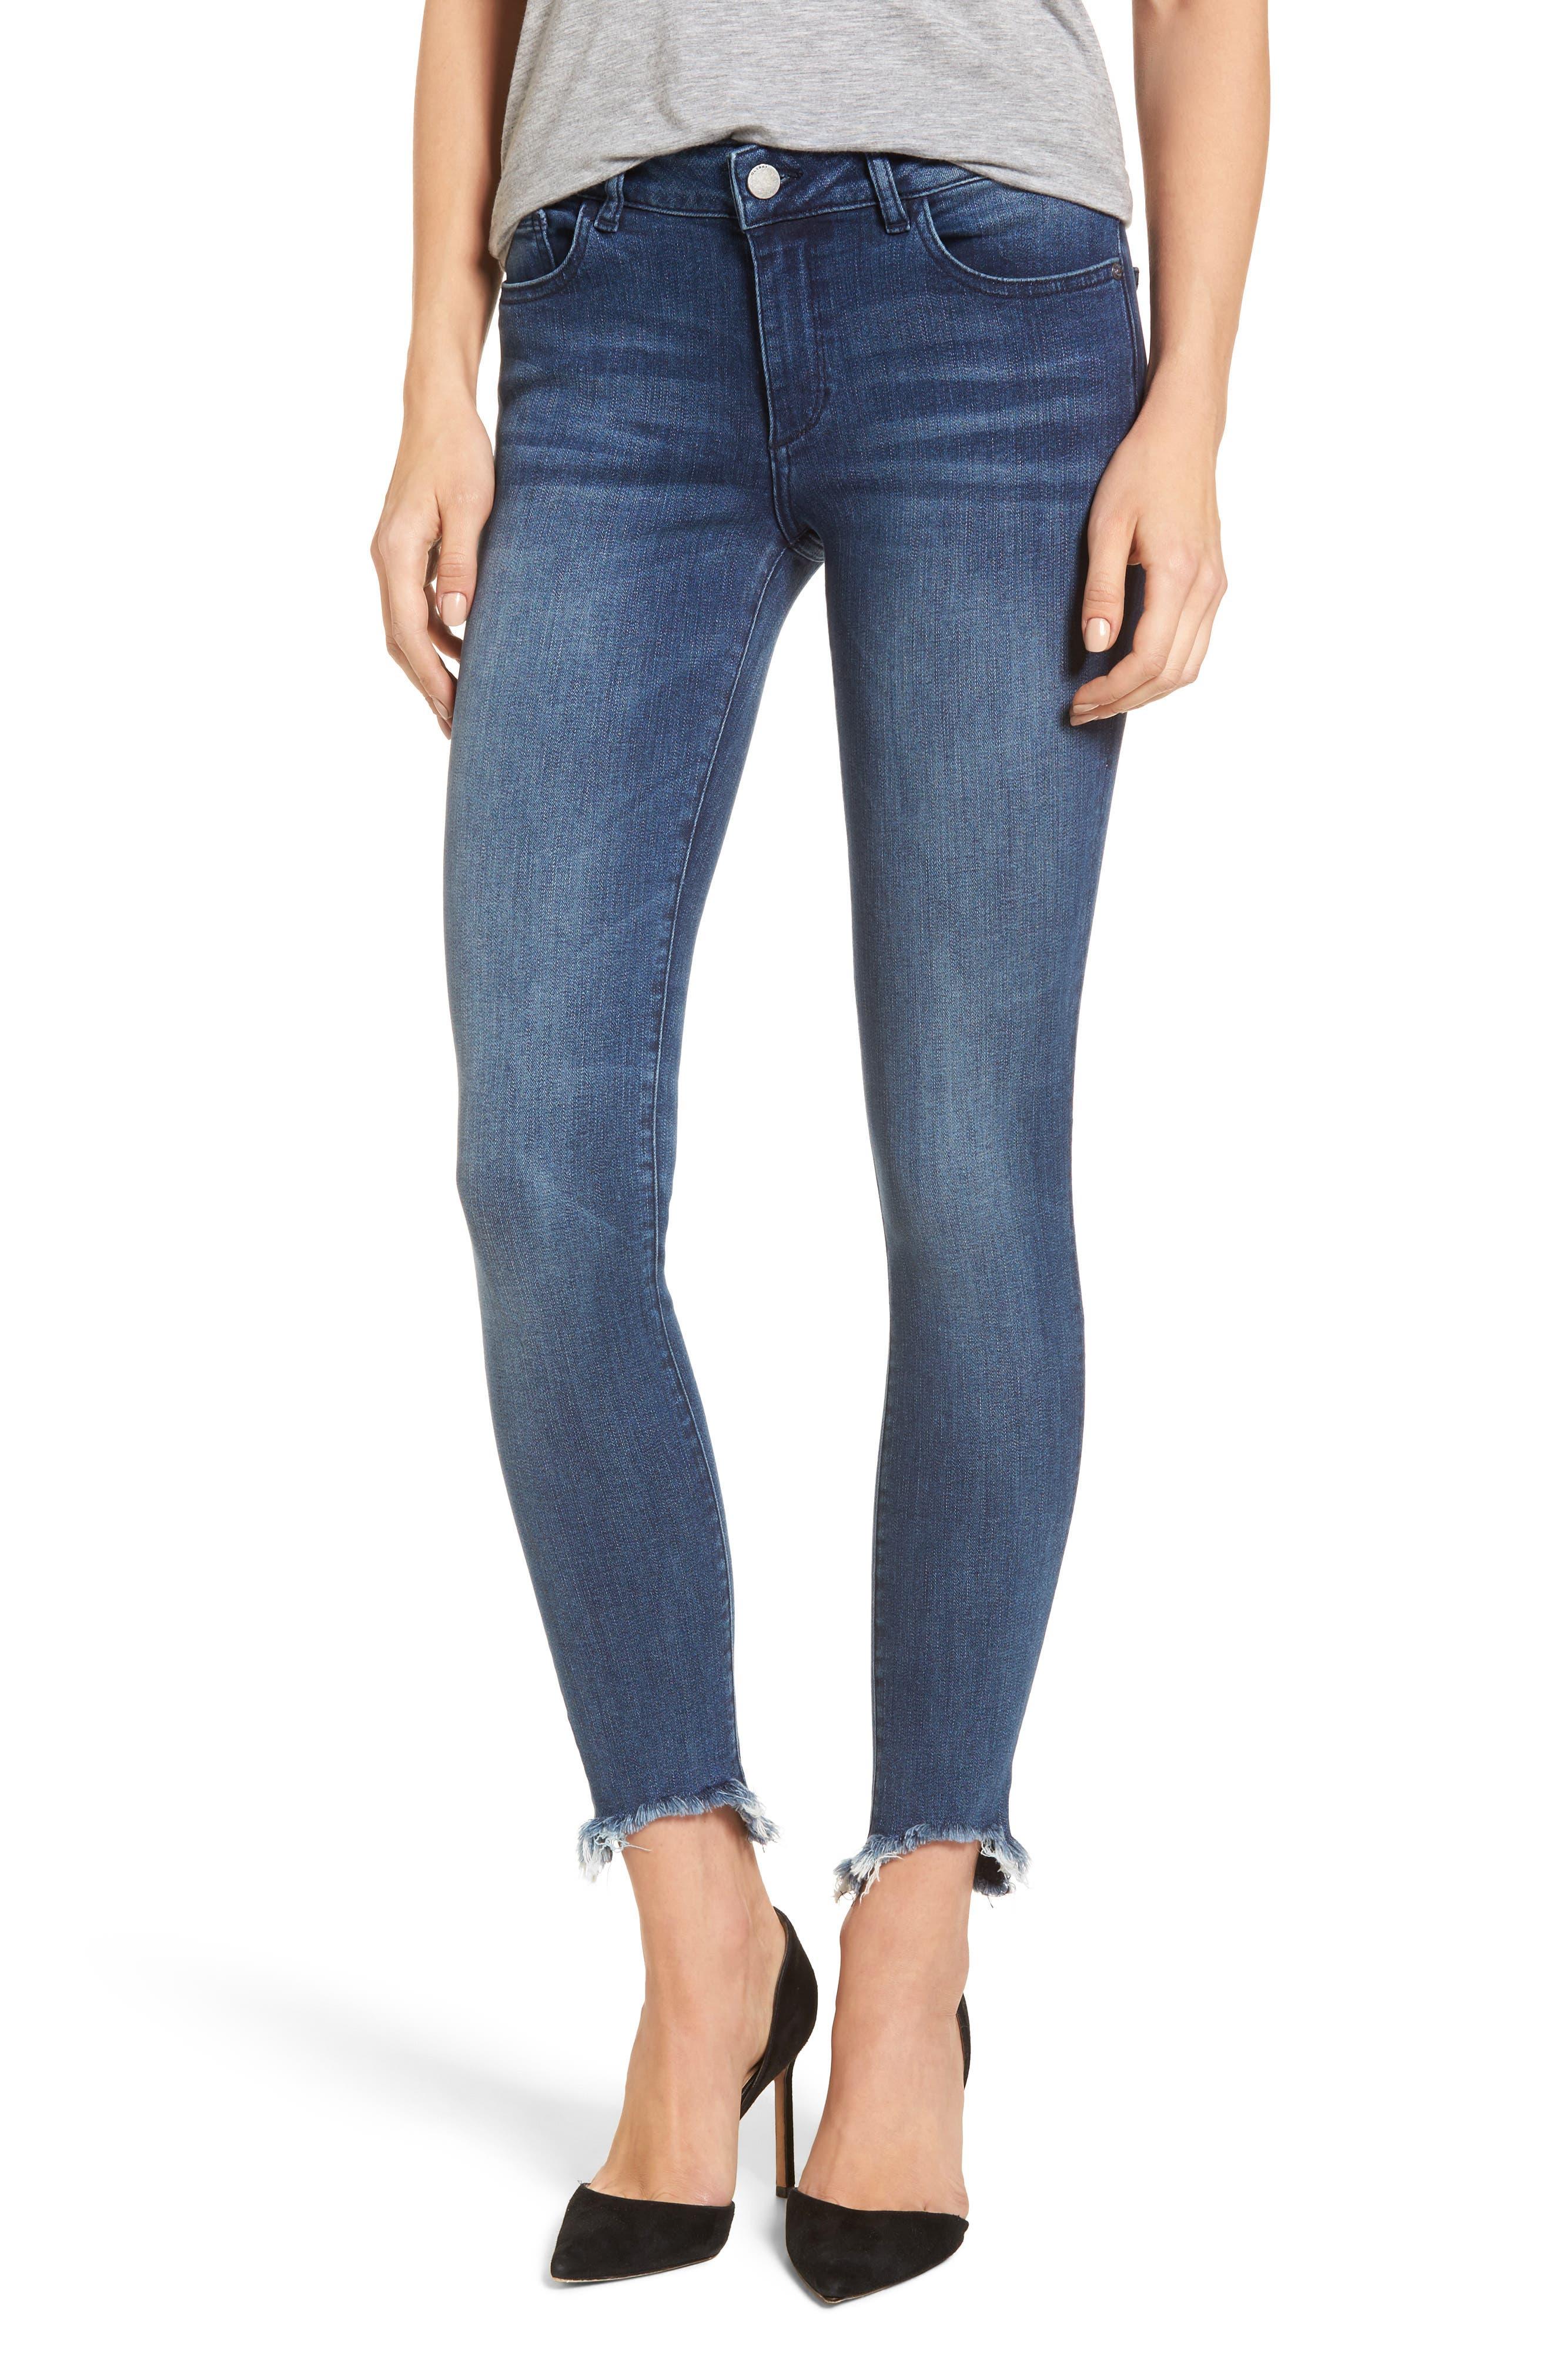 Emma Power Legging Jeans,                         Main,                         color, 425